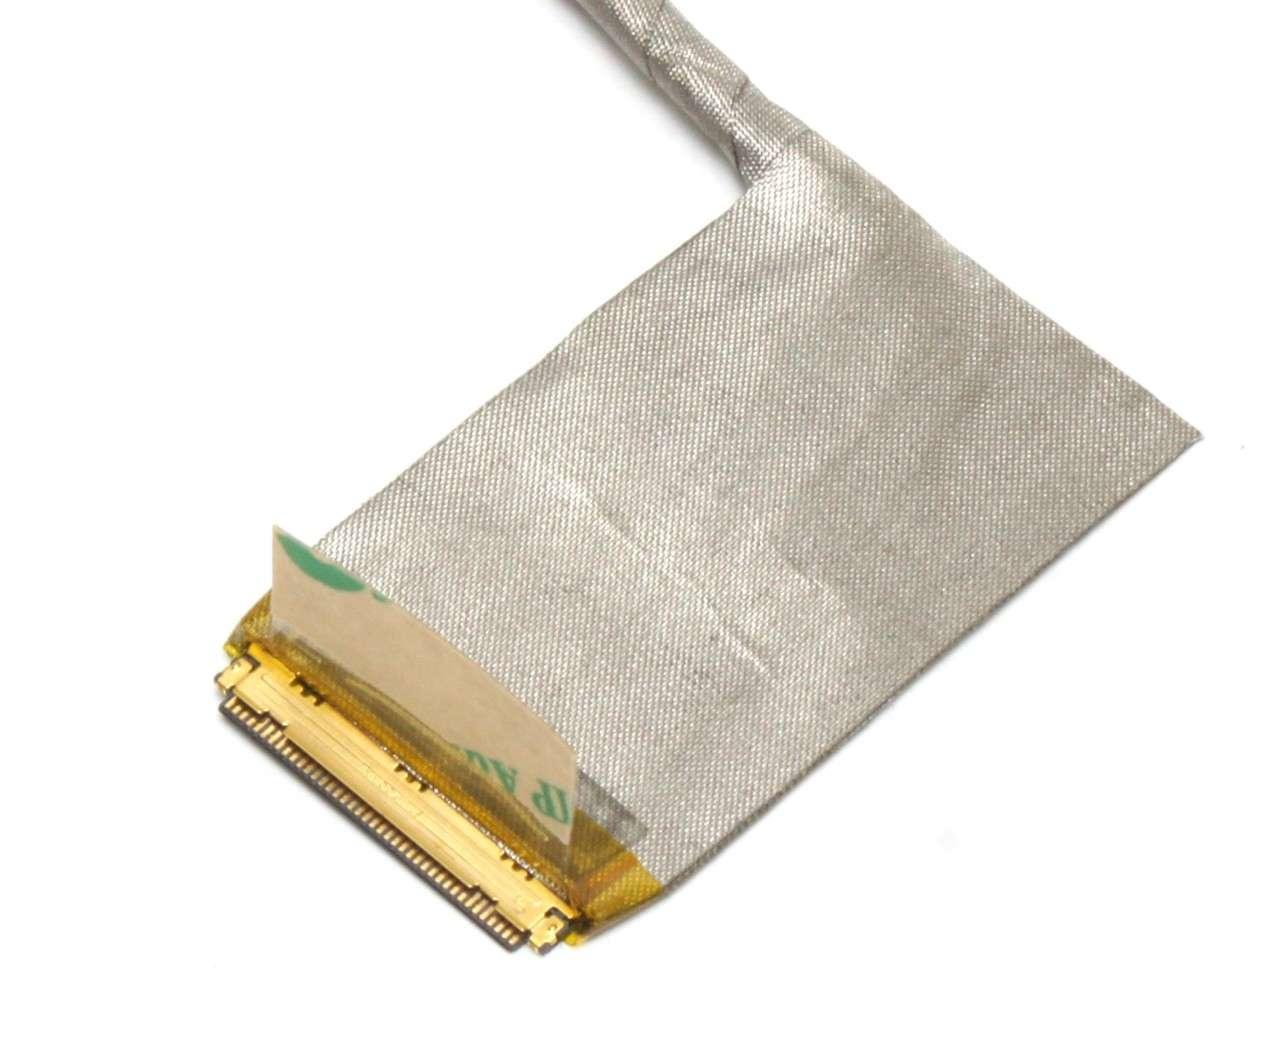 Cablu video LVDS Acer 1422 0110000 imagine powerlaptop.ro 2021